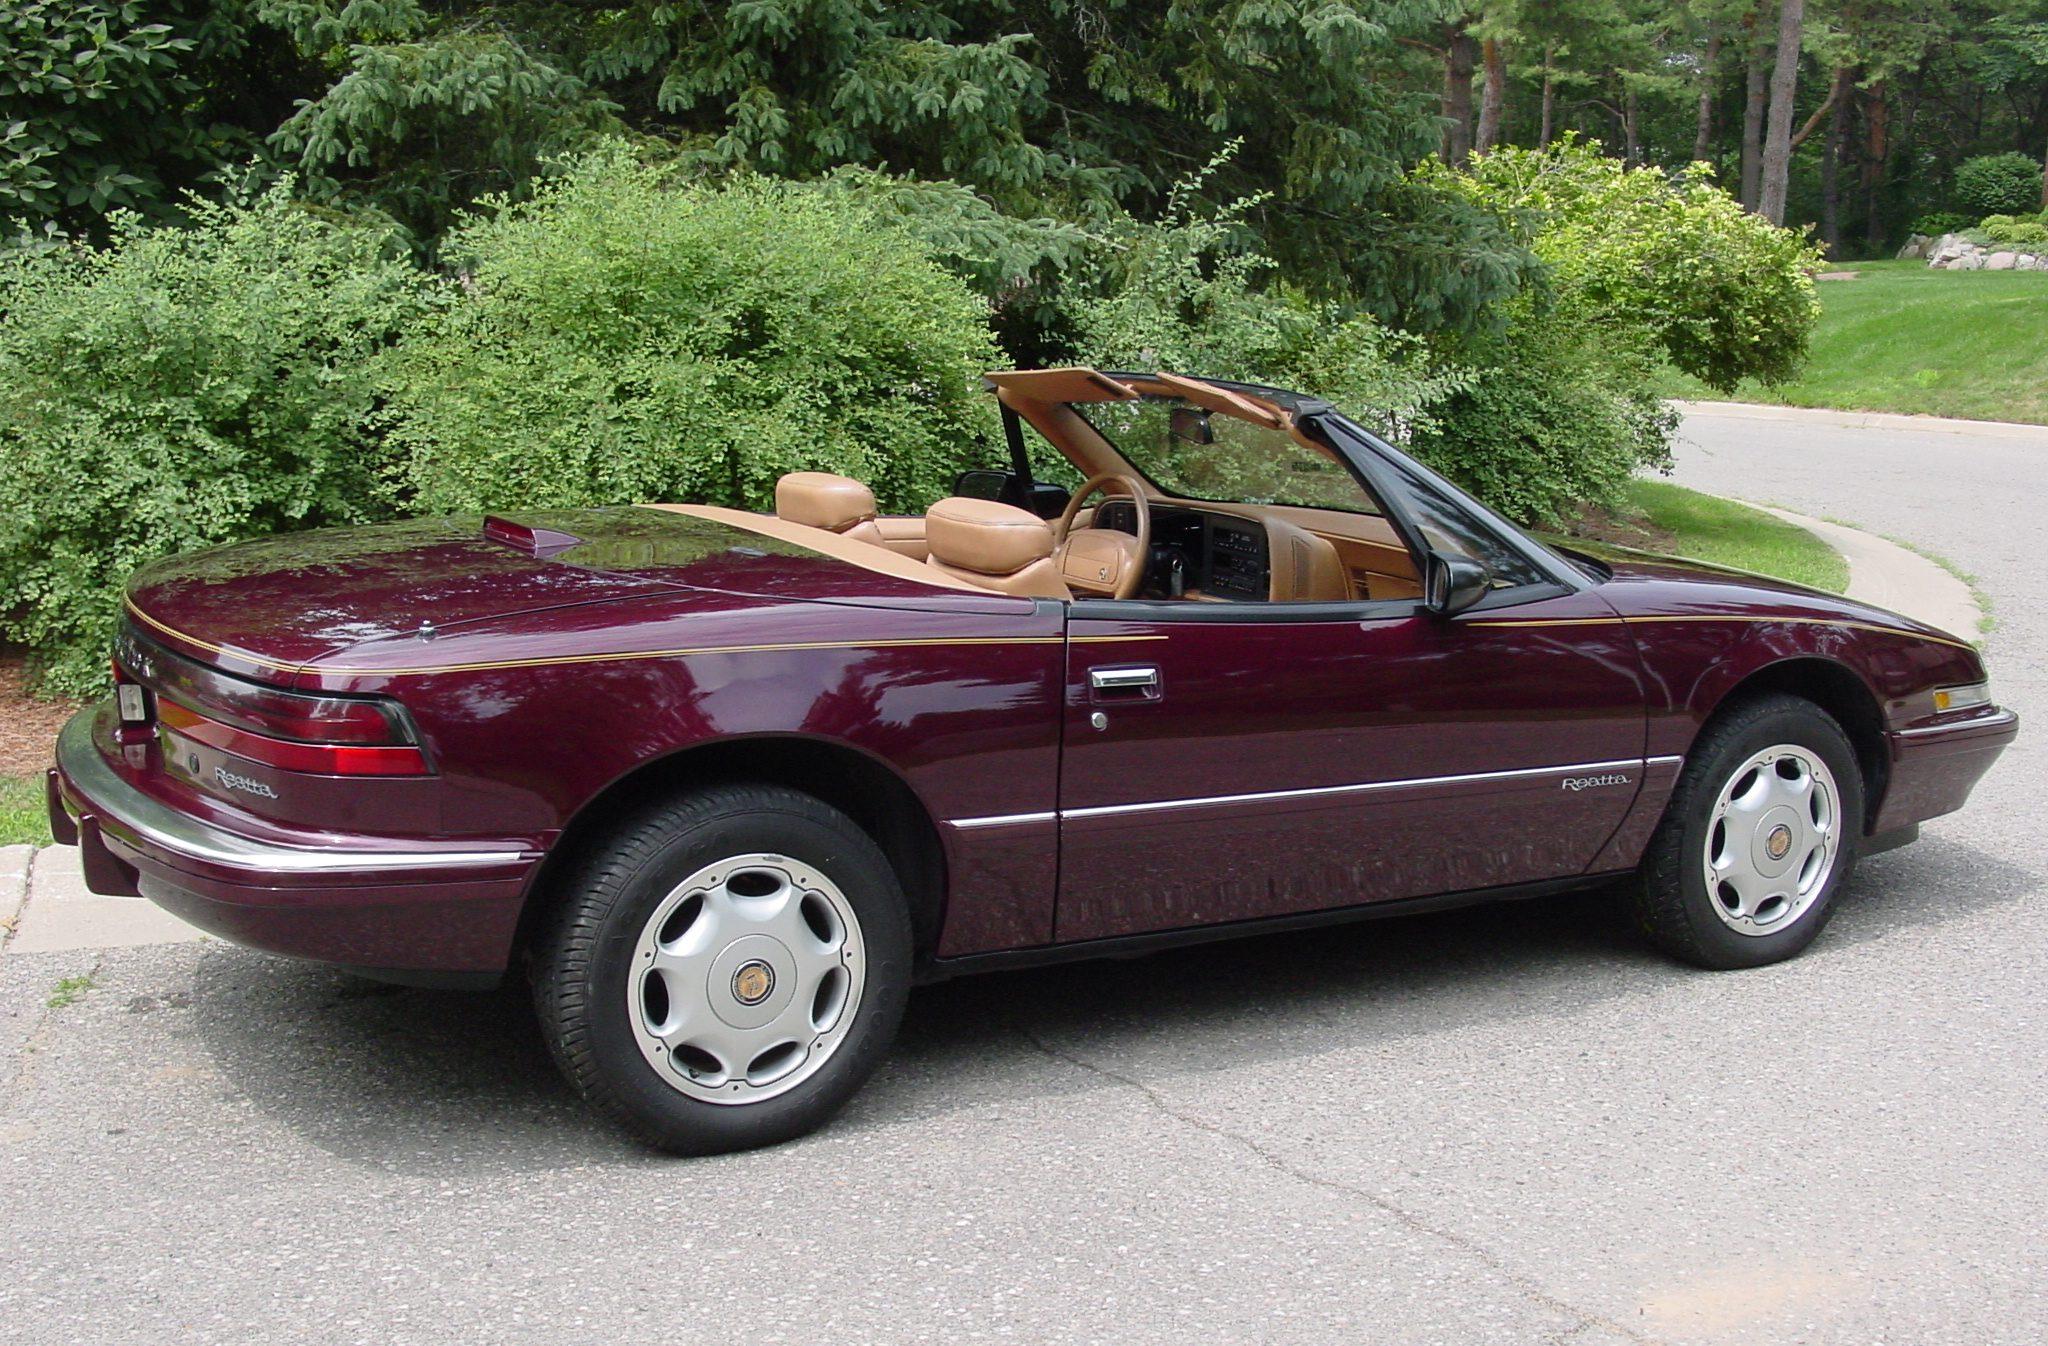 Reatta Convertible Coupe Rear Three-Quarter In Drive